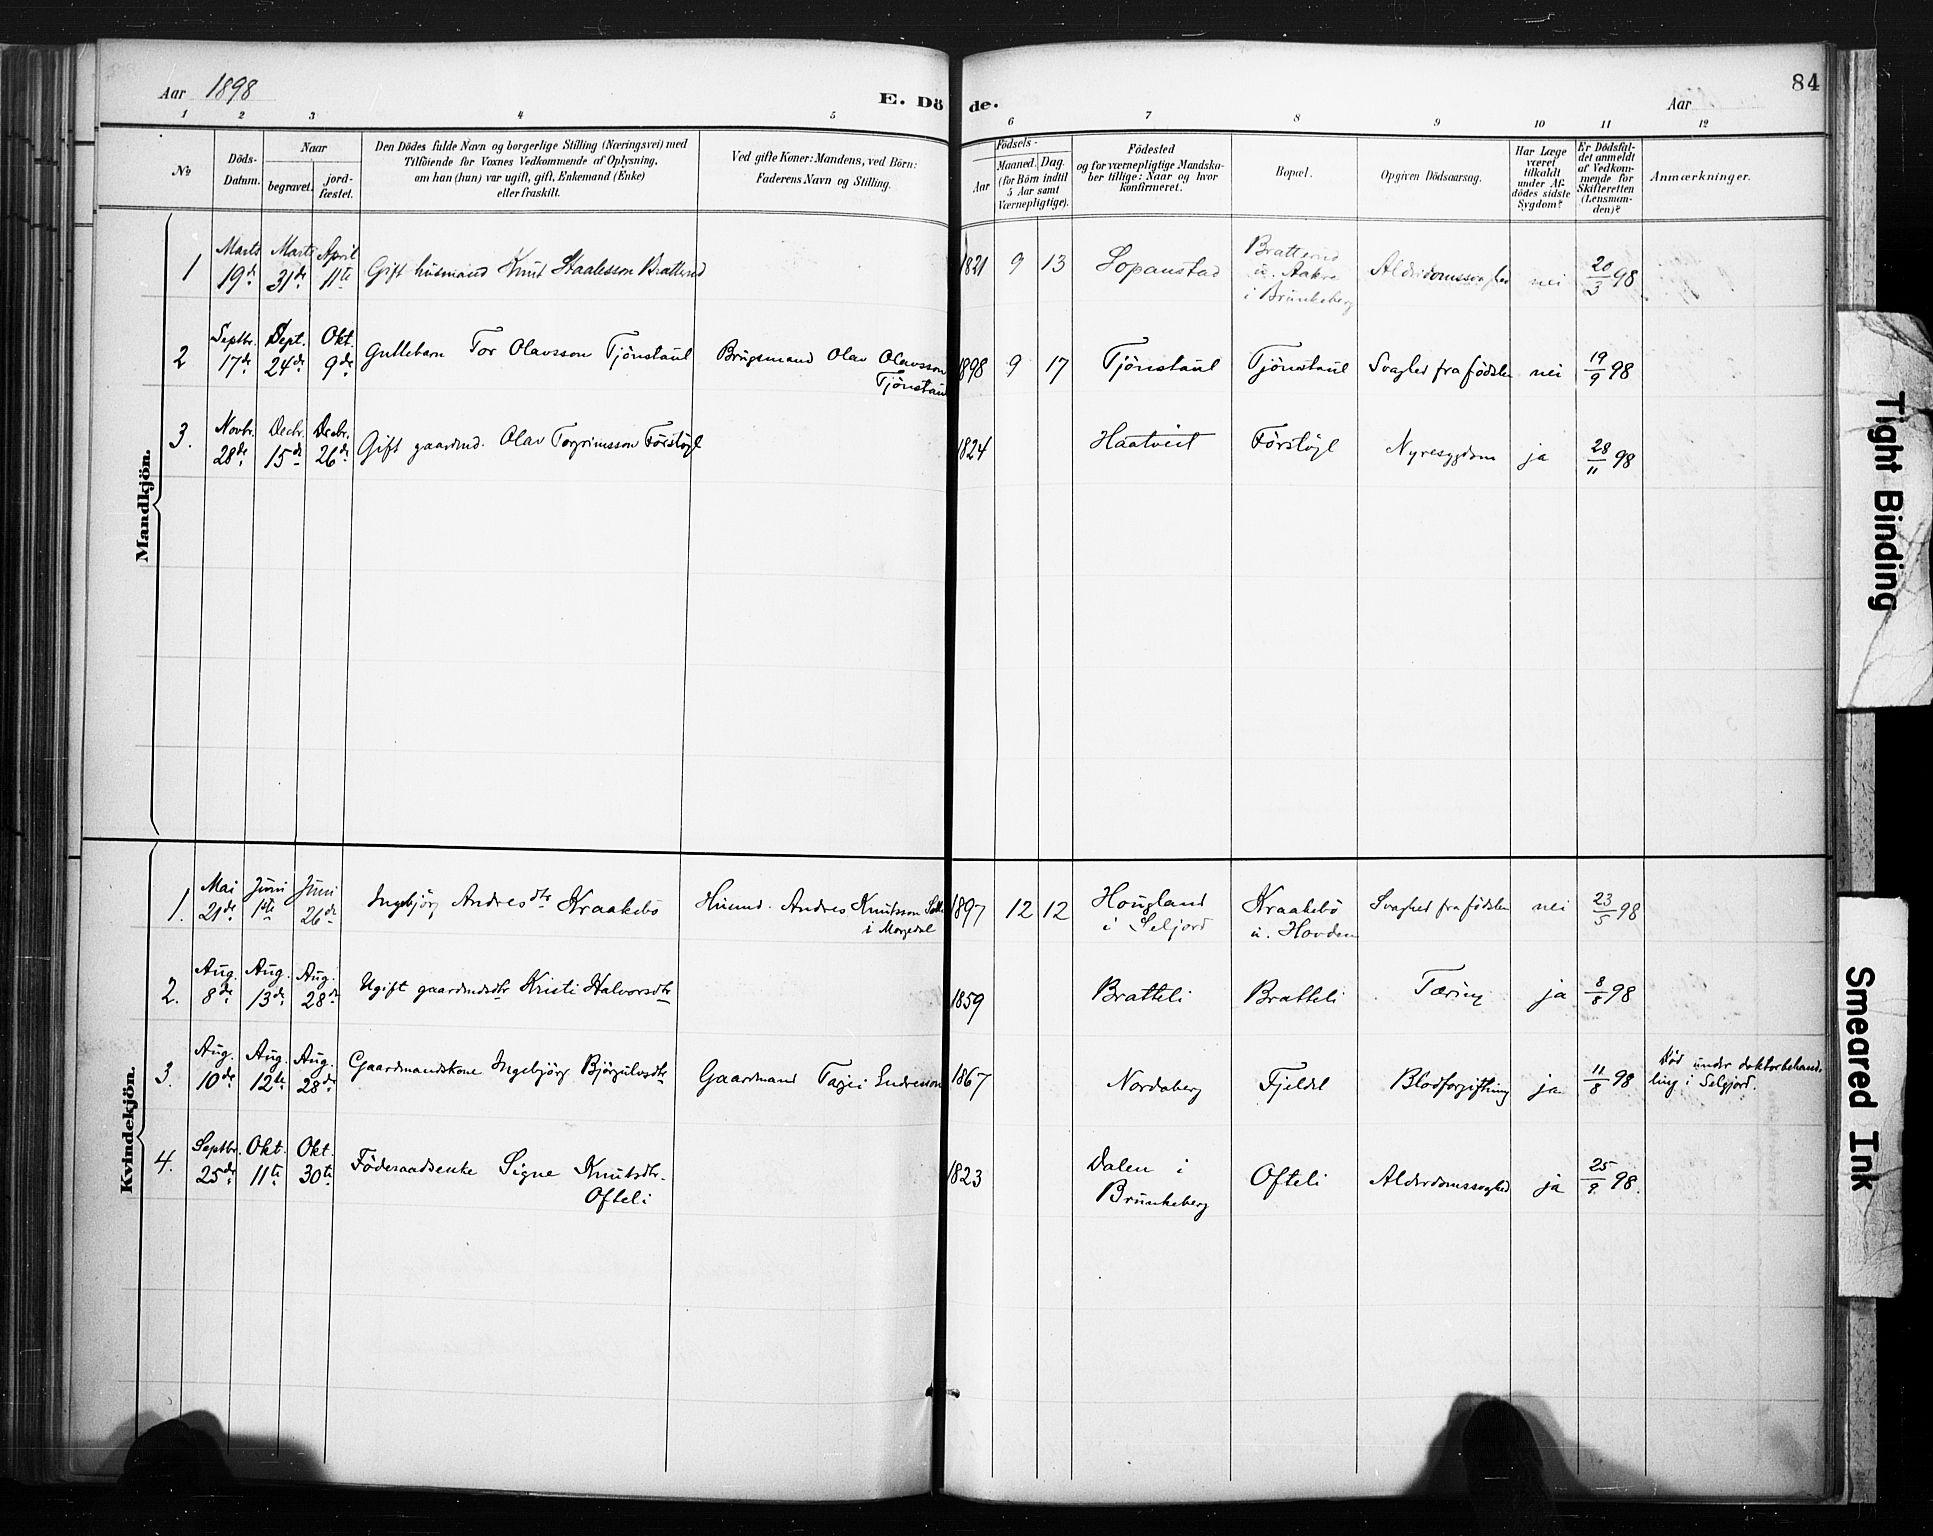 SAKO, Lårdal kirkebøker, F/Fc/L0002: Ministerialbok nr. III 2, 1887-1906, s. 84